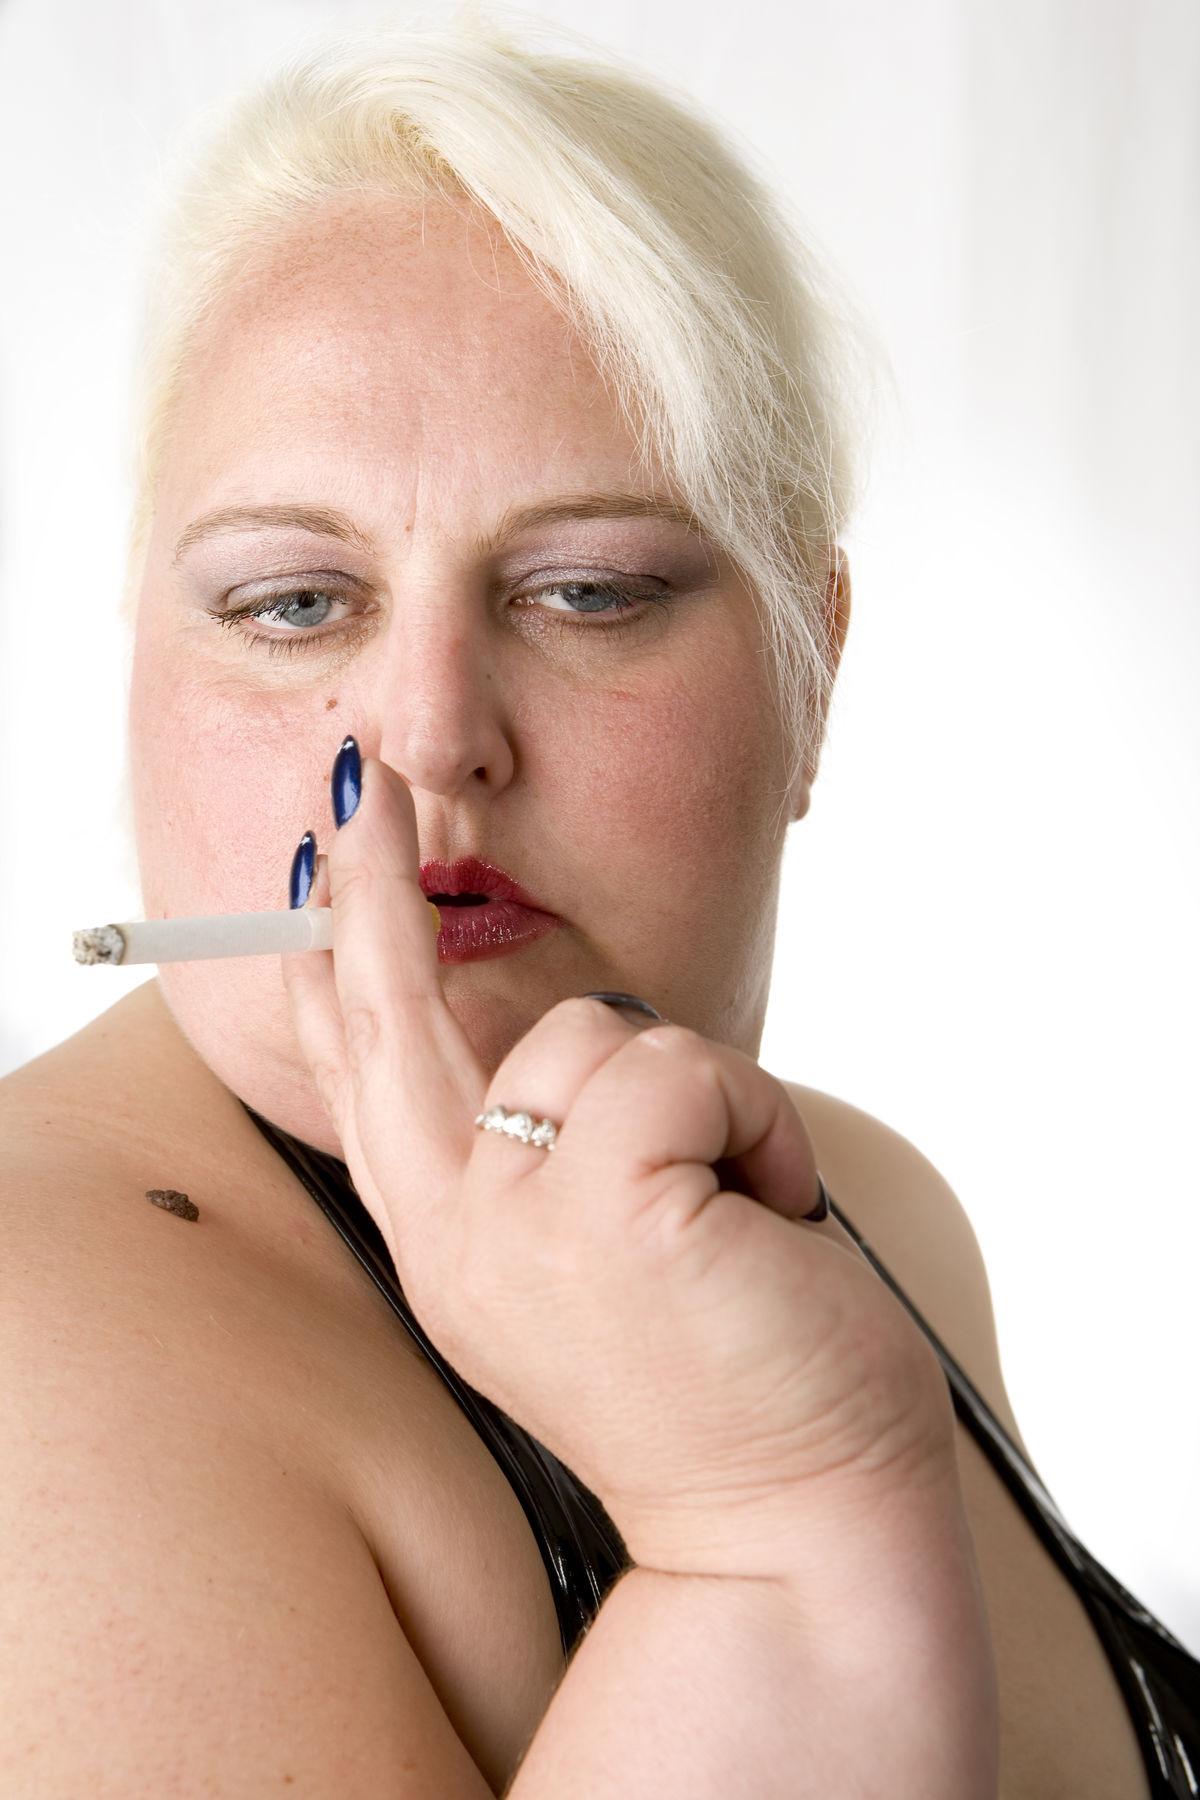 Do You Smoke? Are You Morbidly Obese? No Surgery for You